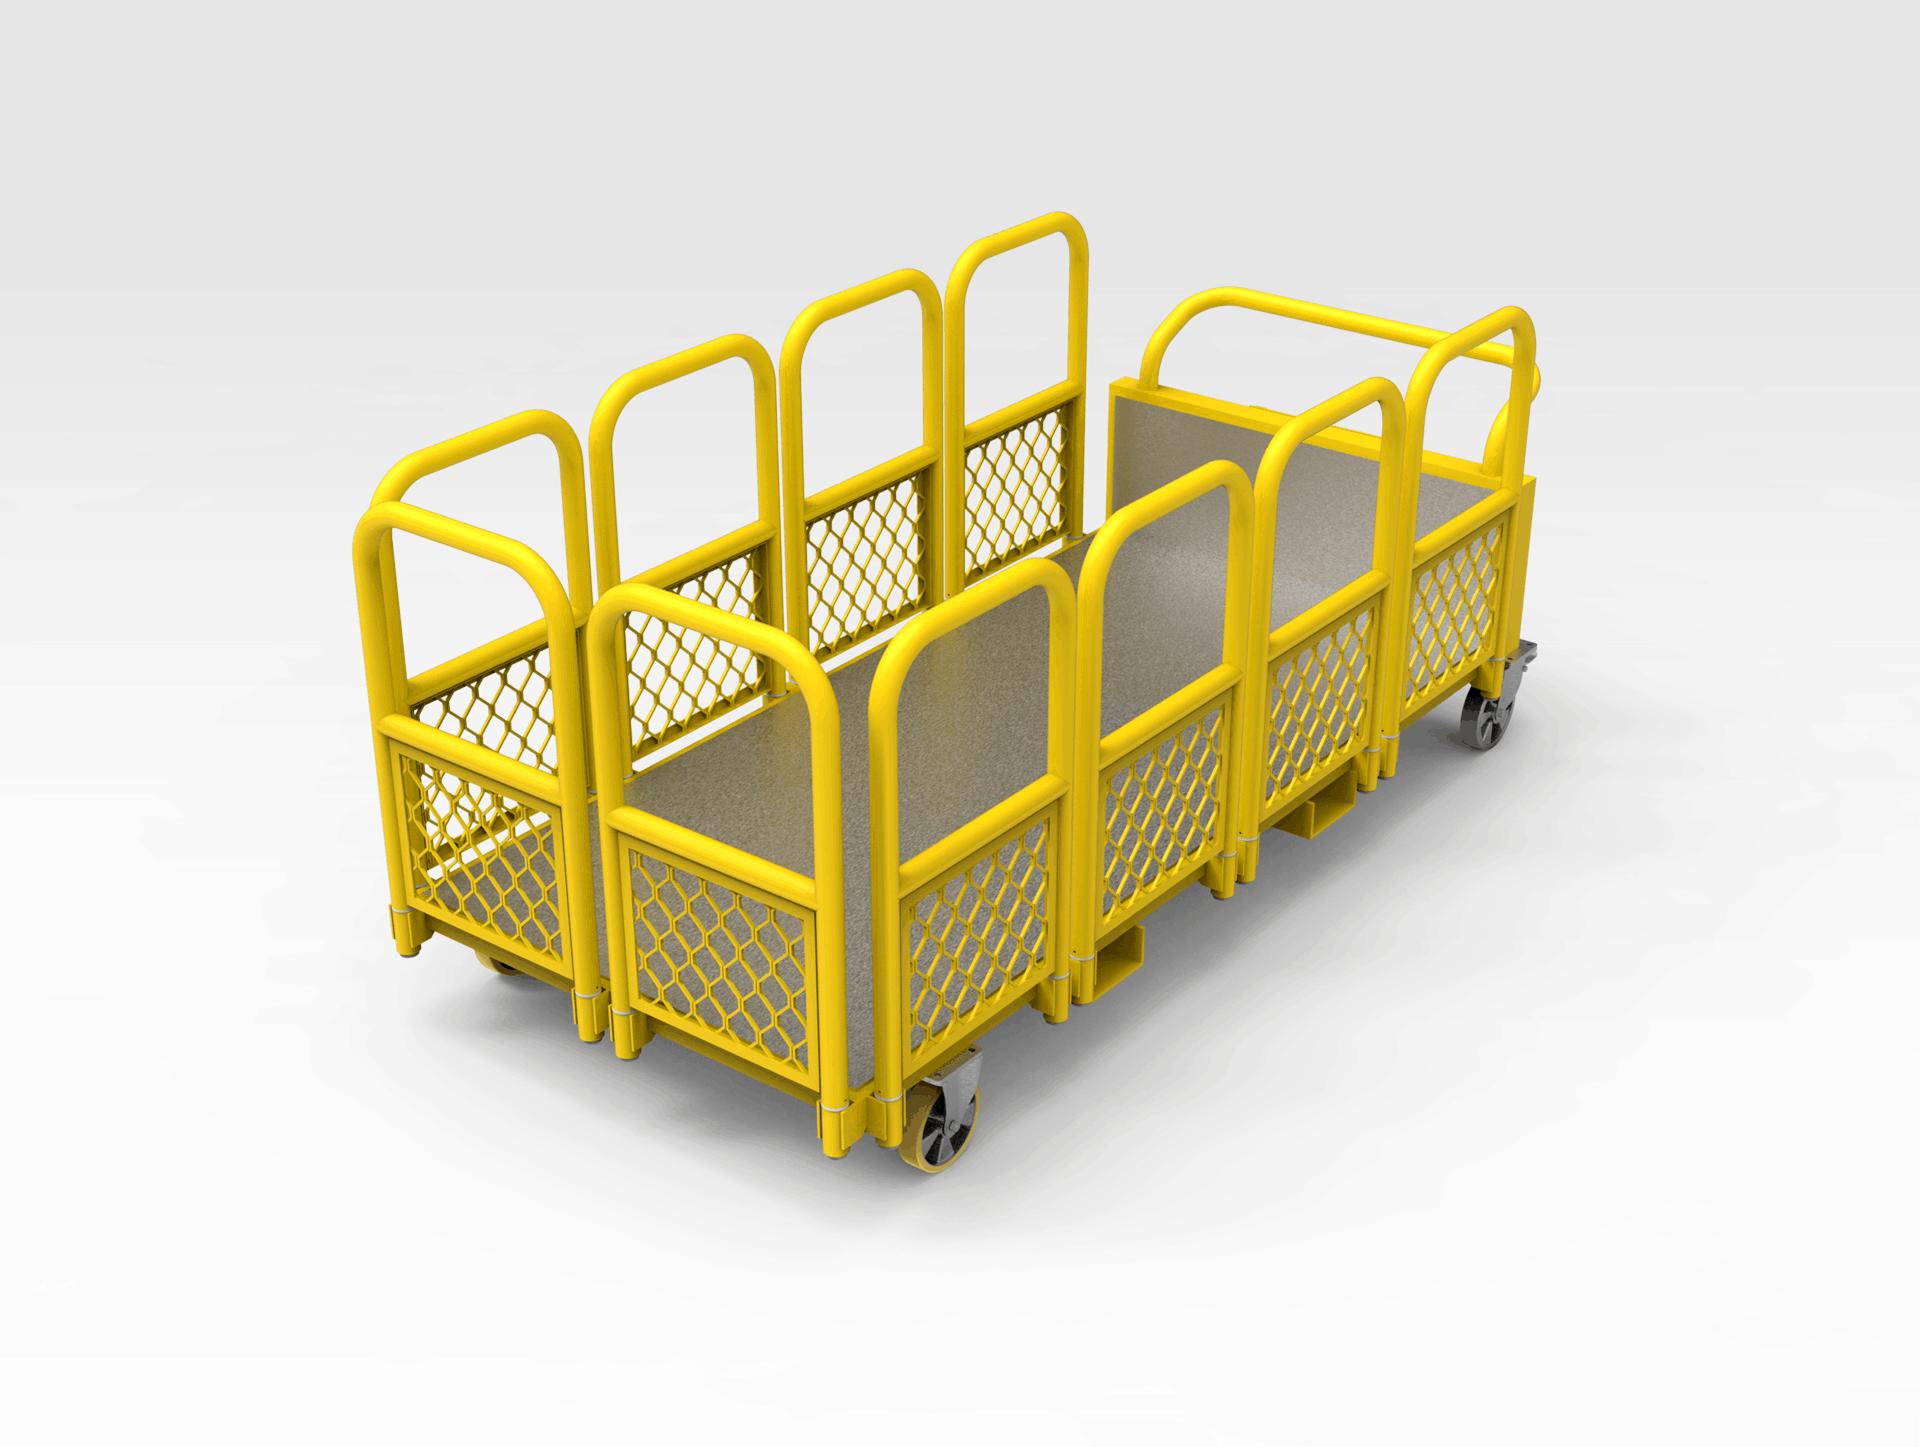 Workshop Maintenance Transport Trolley